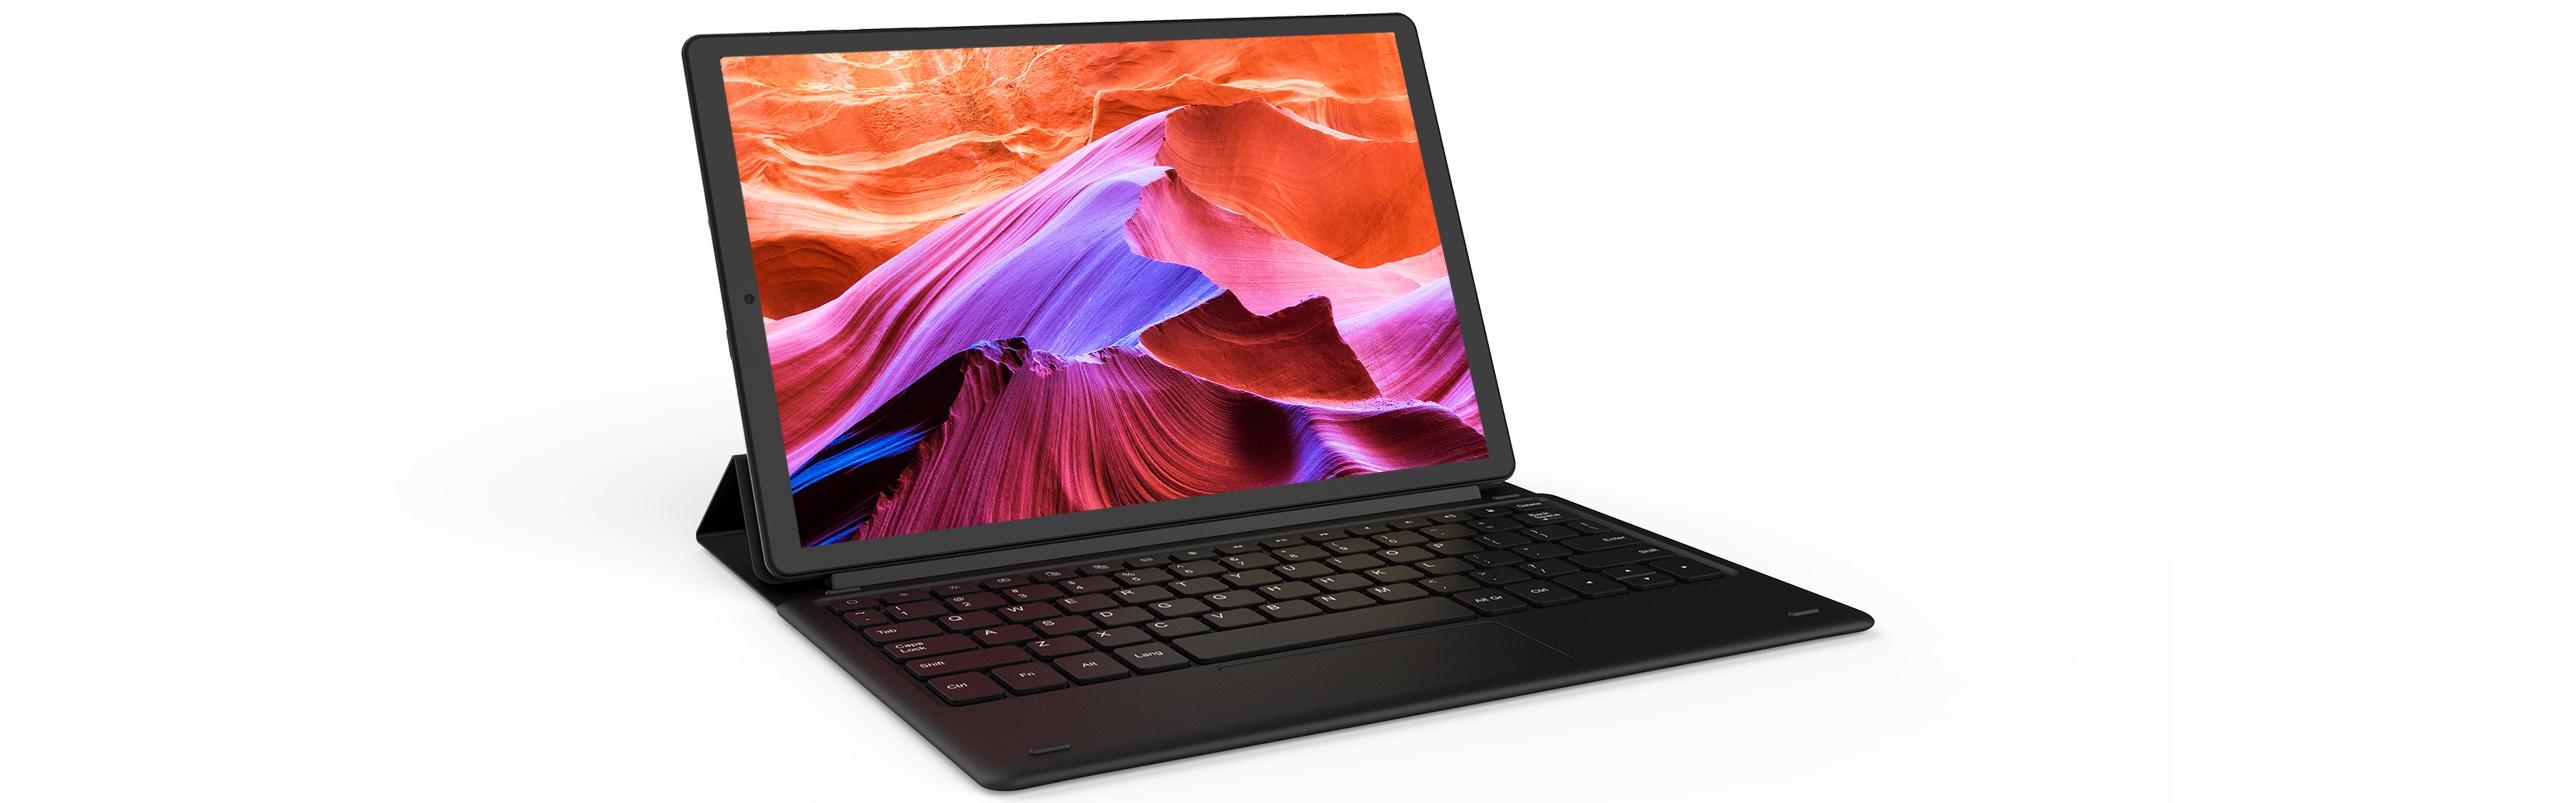 Chuwi HiPad X tablet